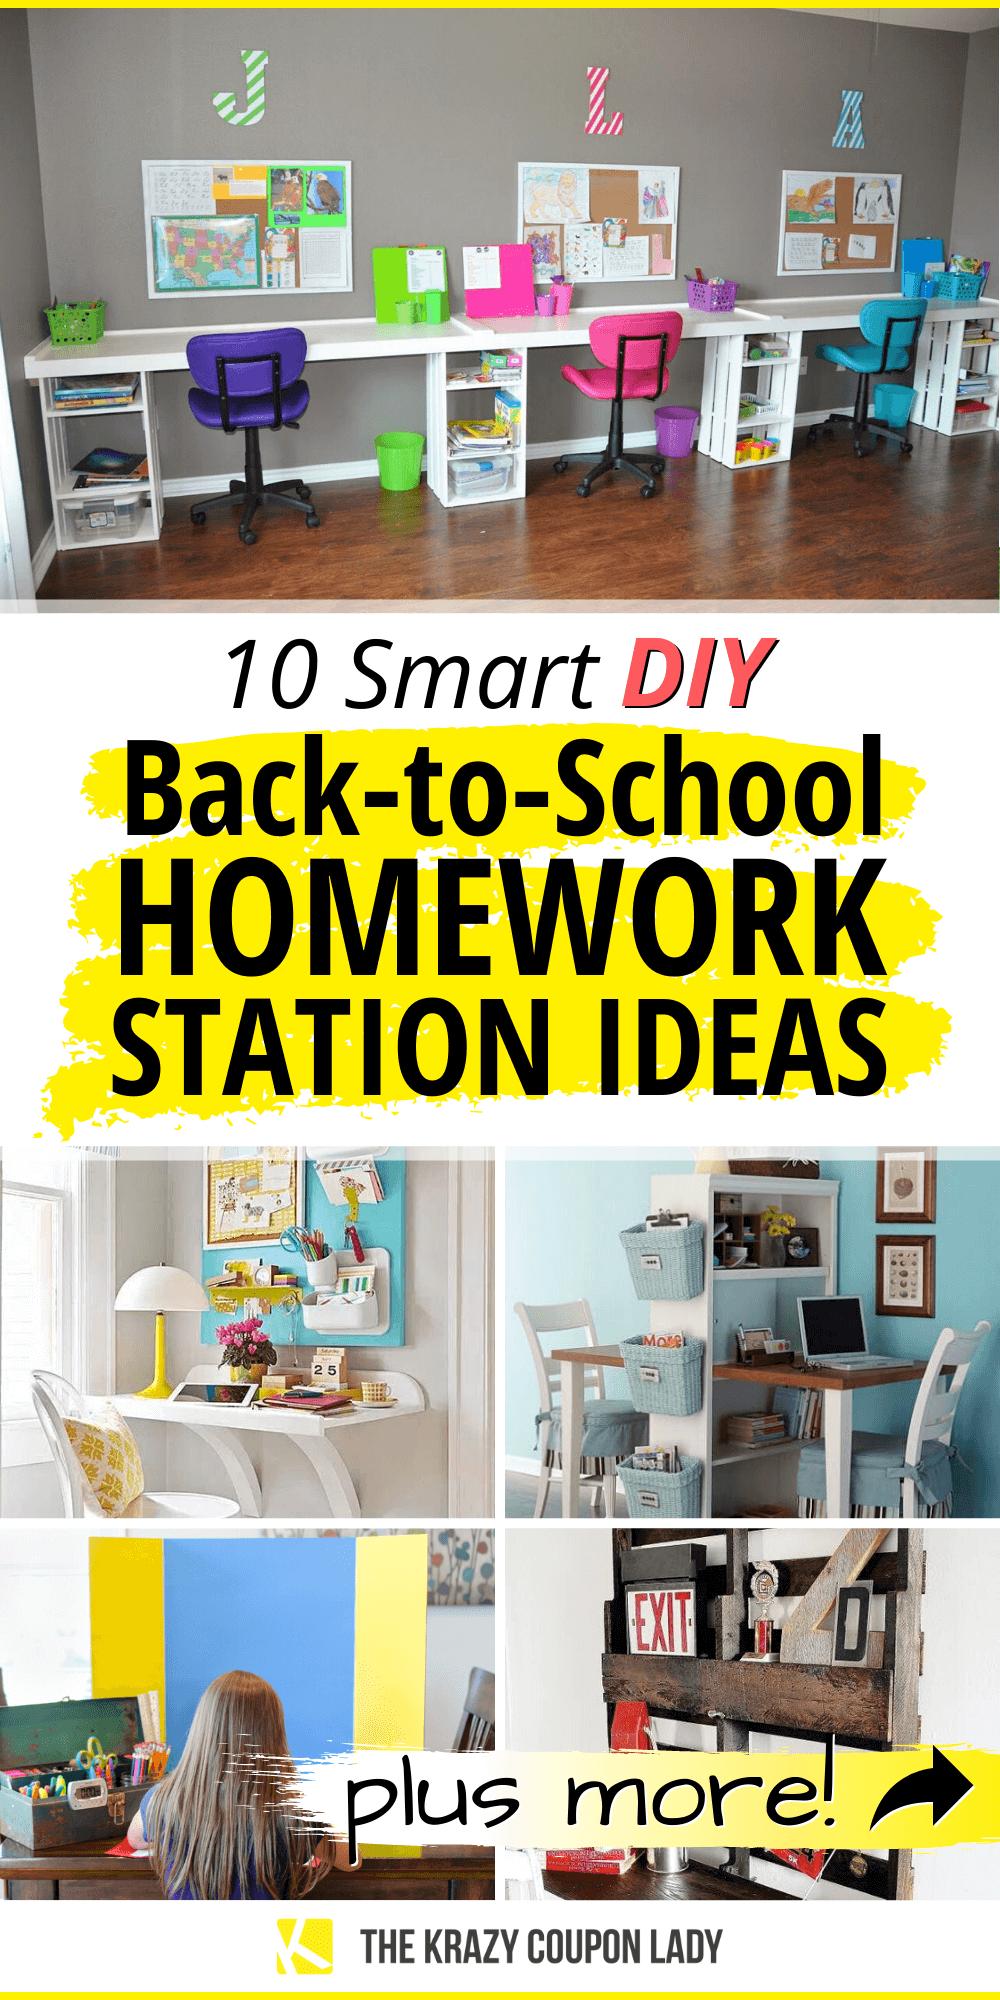 10 Diy Back To School Homework Station Ideas Kids Homework Station Kids Homework Station Diy Homework Station Diy